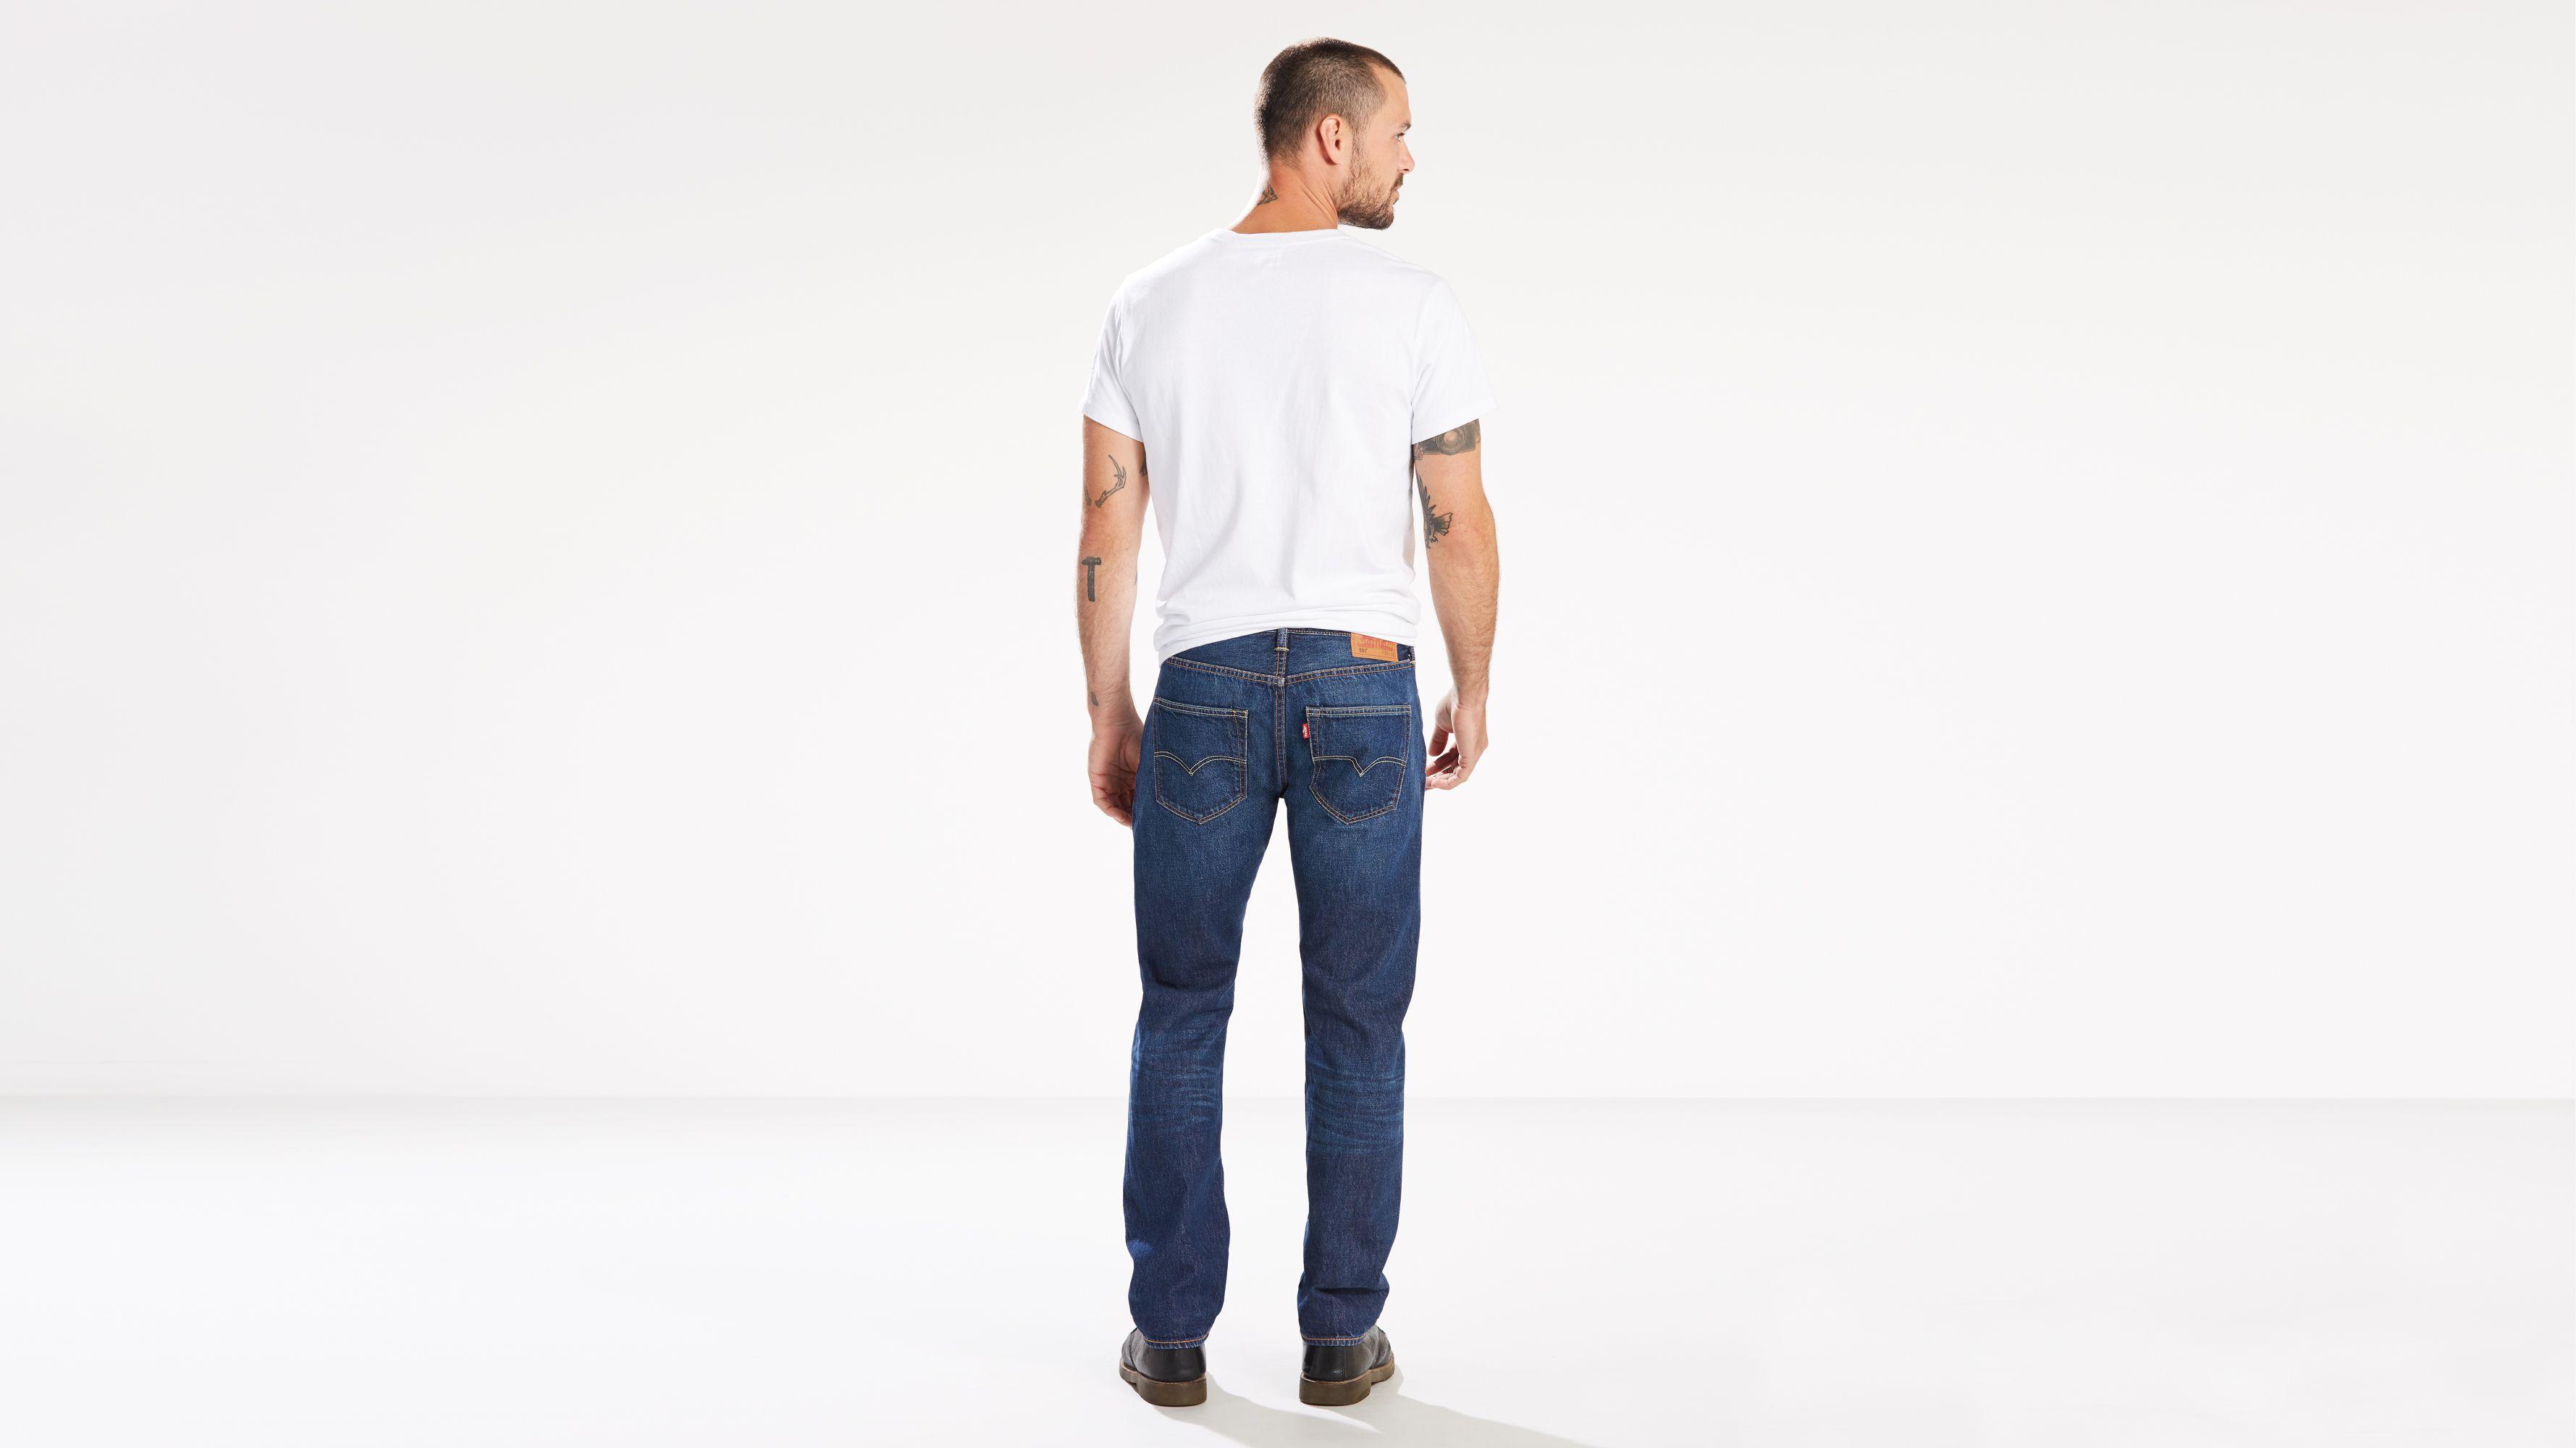 d5669418610 Levi's® Made In The Usa 501® Original Fit Selvedge Men's Jeans - Medium  Wash | Levi's® US